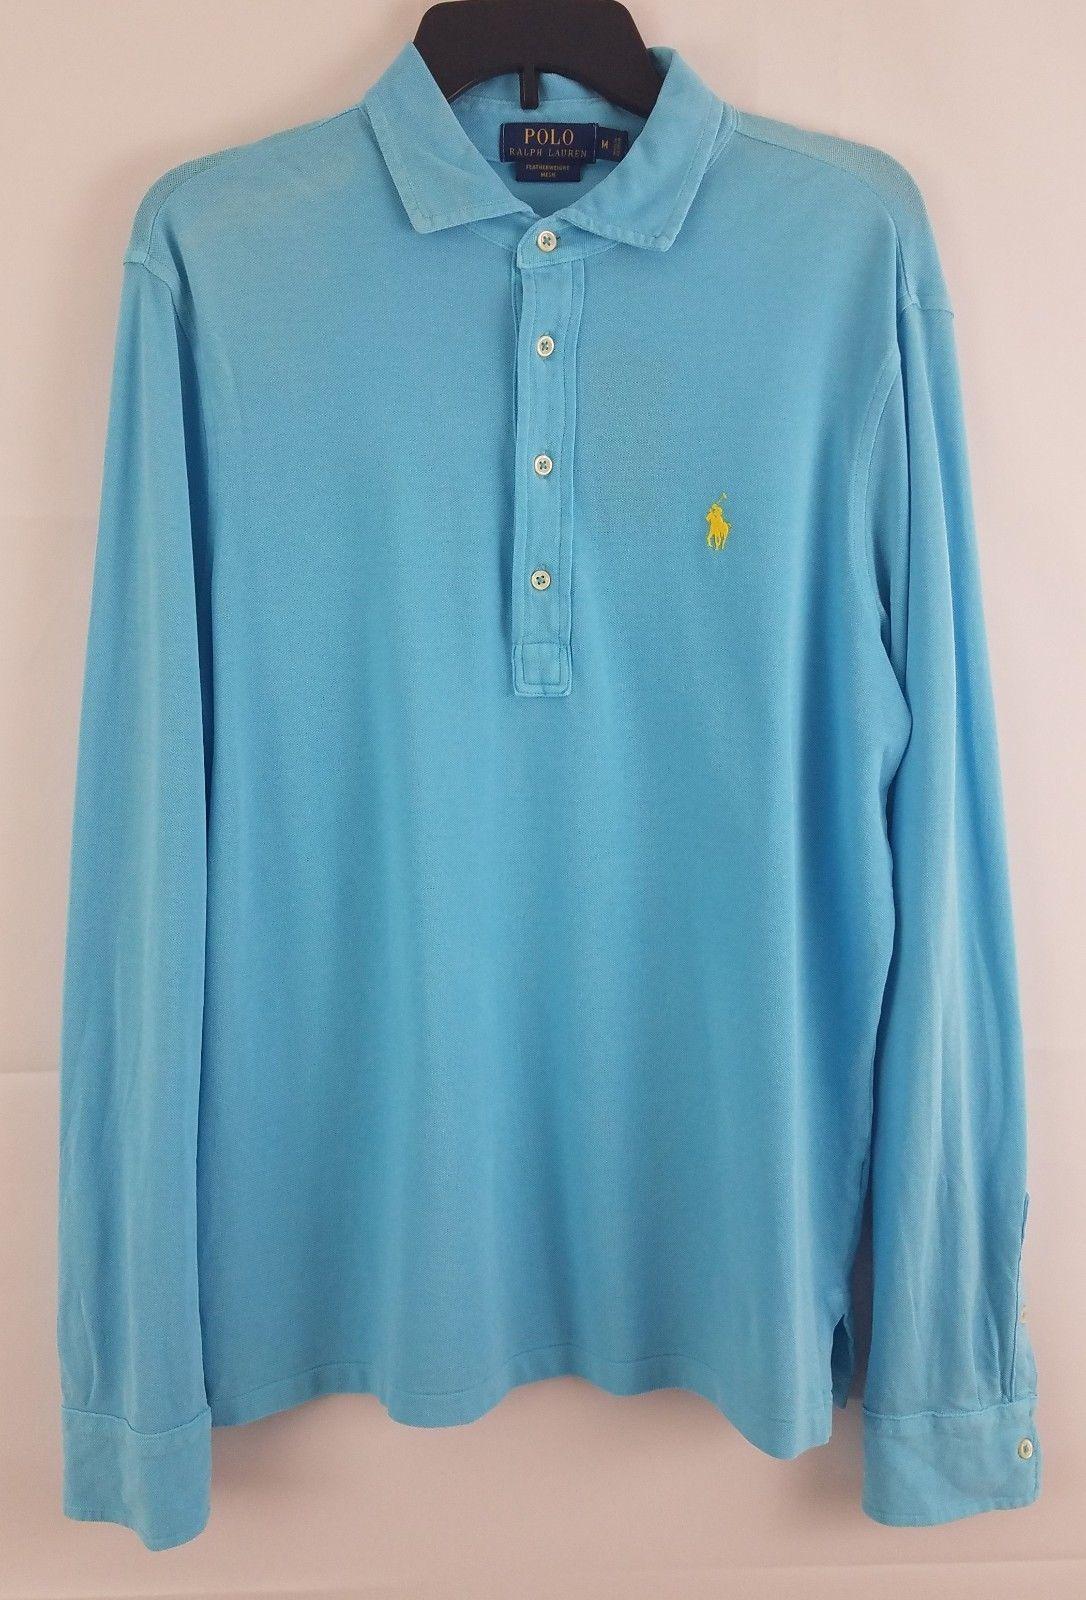 e84170c0a Polo Ralph Lauren Men's Long-Sleeve Mesh and 50 similar items